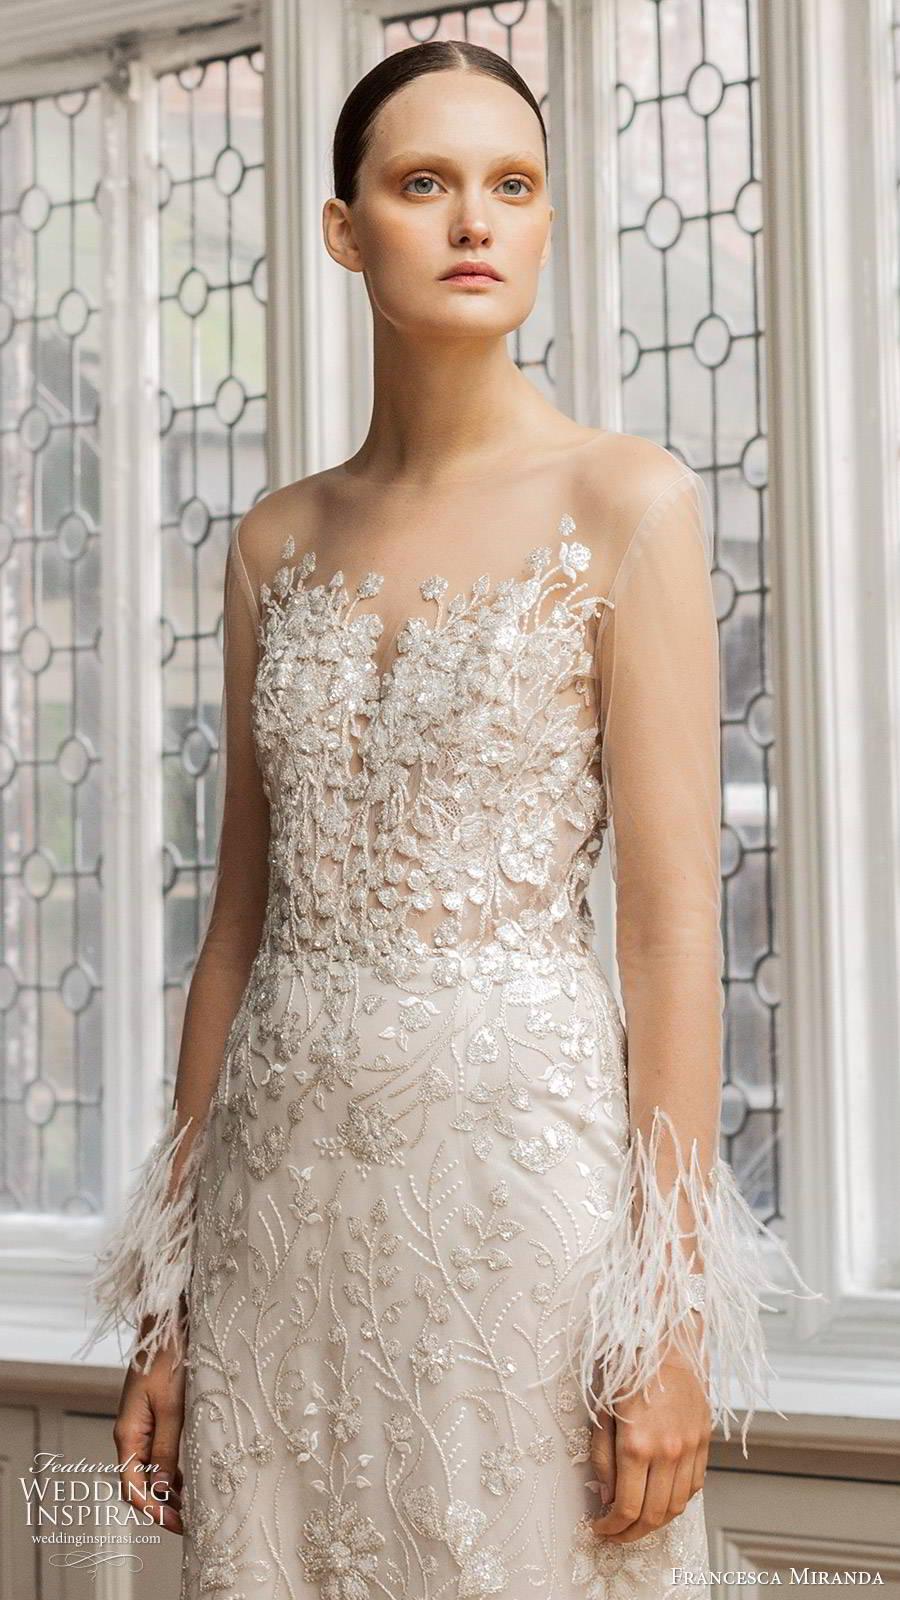 francesca miranda spring 2020 bridal illusion long sleeves sheer bateau sweetheart neckline fully embellished sheath wedding dress feathers glitzy sweep train (1) zv